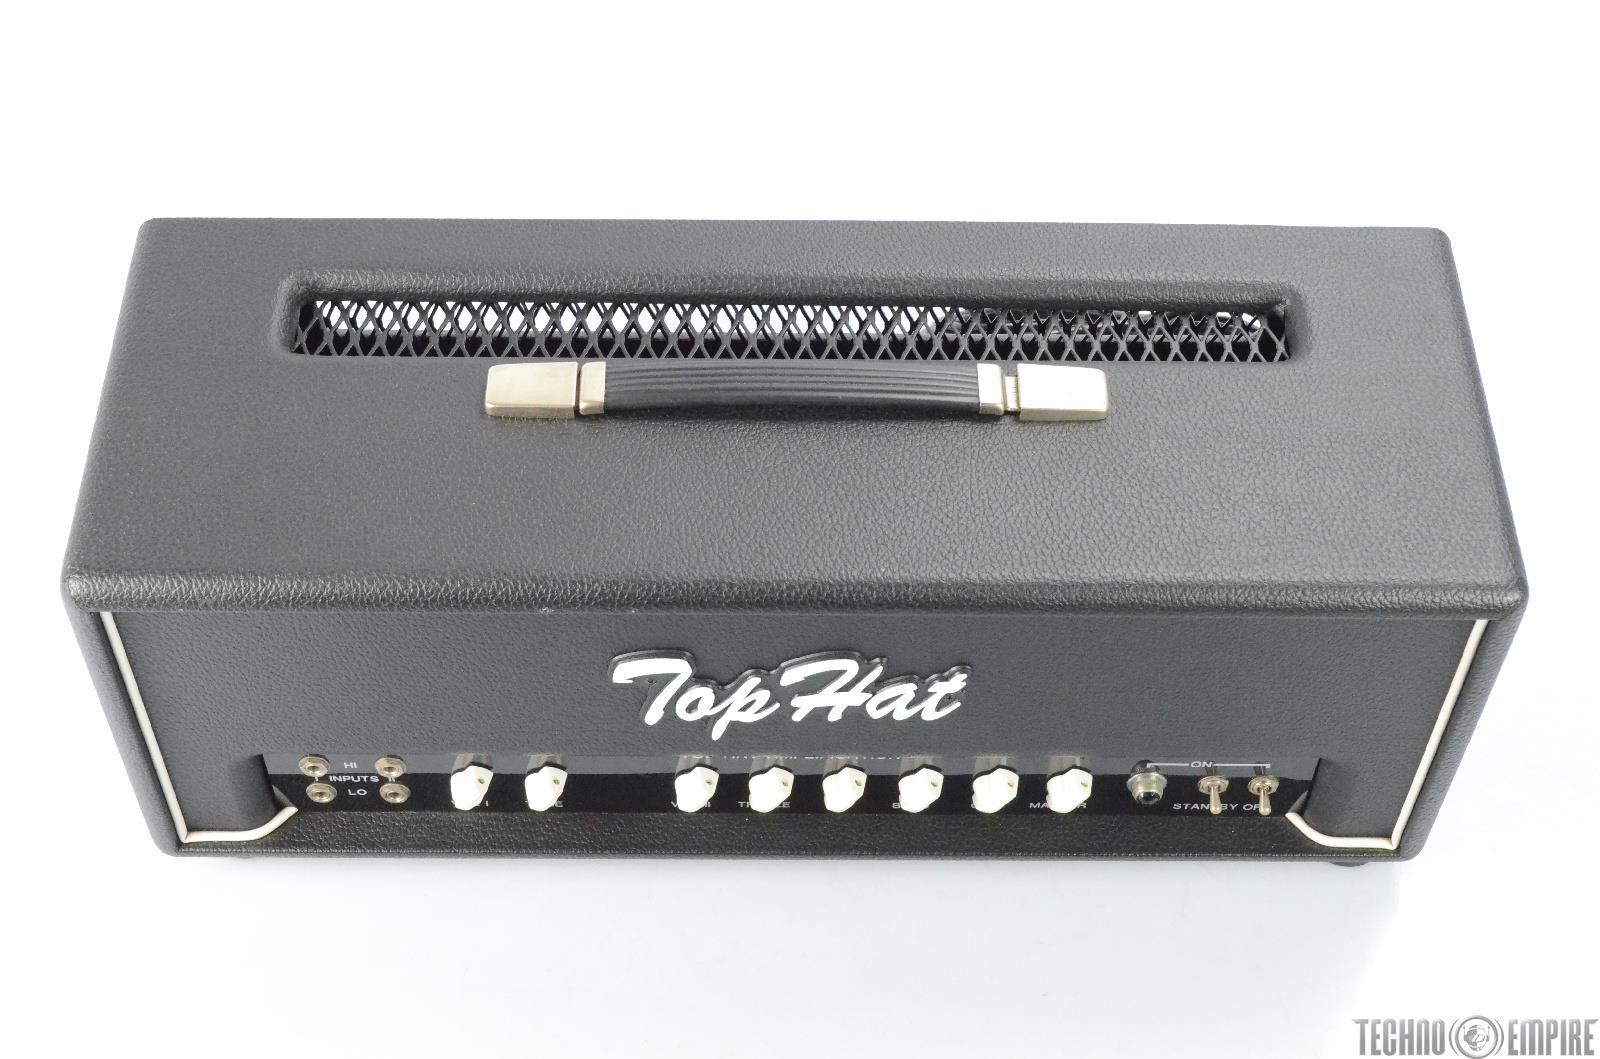 top hat king royale t 35tb guitar tube amplifier amp head 35 watts 29650 ebay. Black Bedroom Furniture Sets. Home Design Ideas